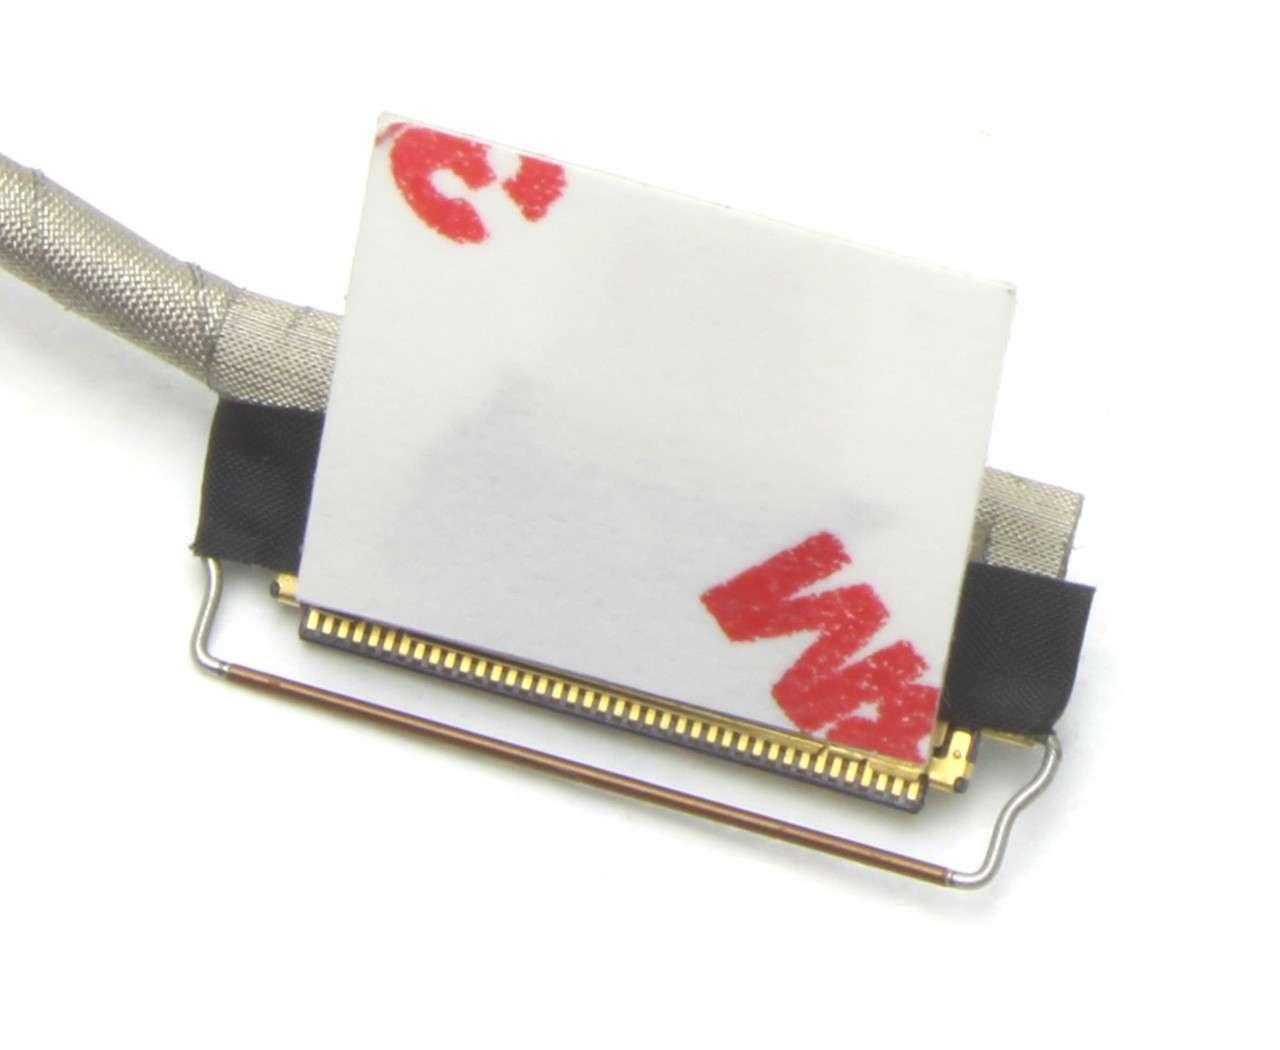 Cablu video eDP Dell Inspiron 15 5555 40 pini FULL HD 1920x1080 cu touchscreen imagine powerlaptop.ro 2021